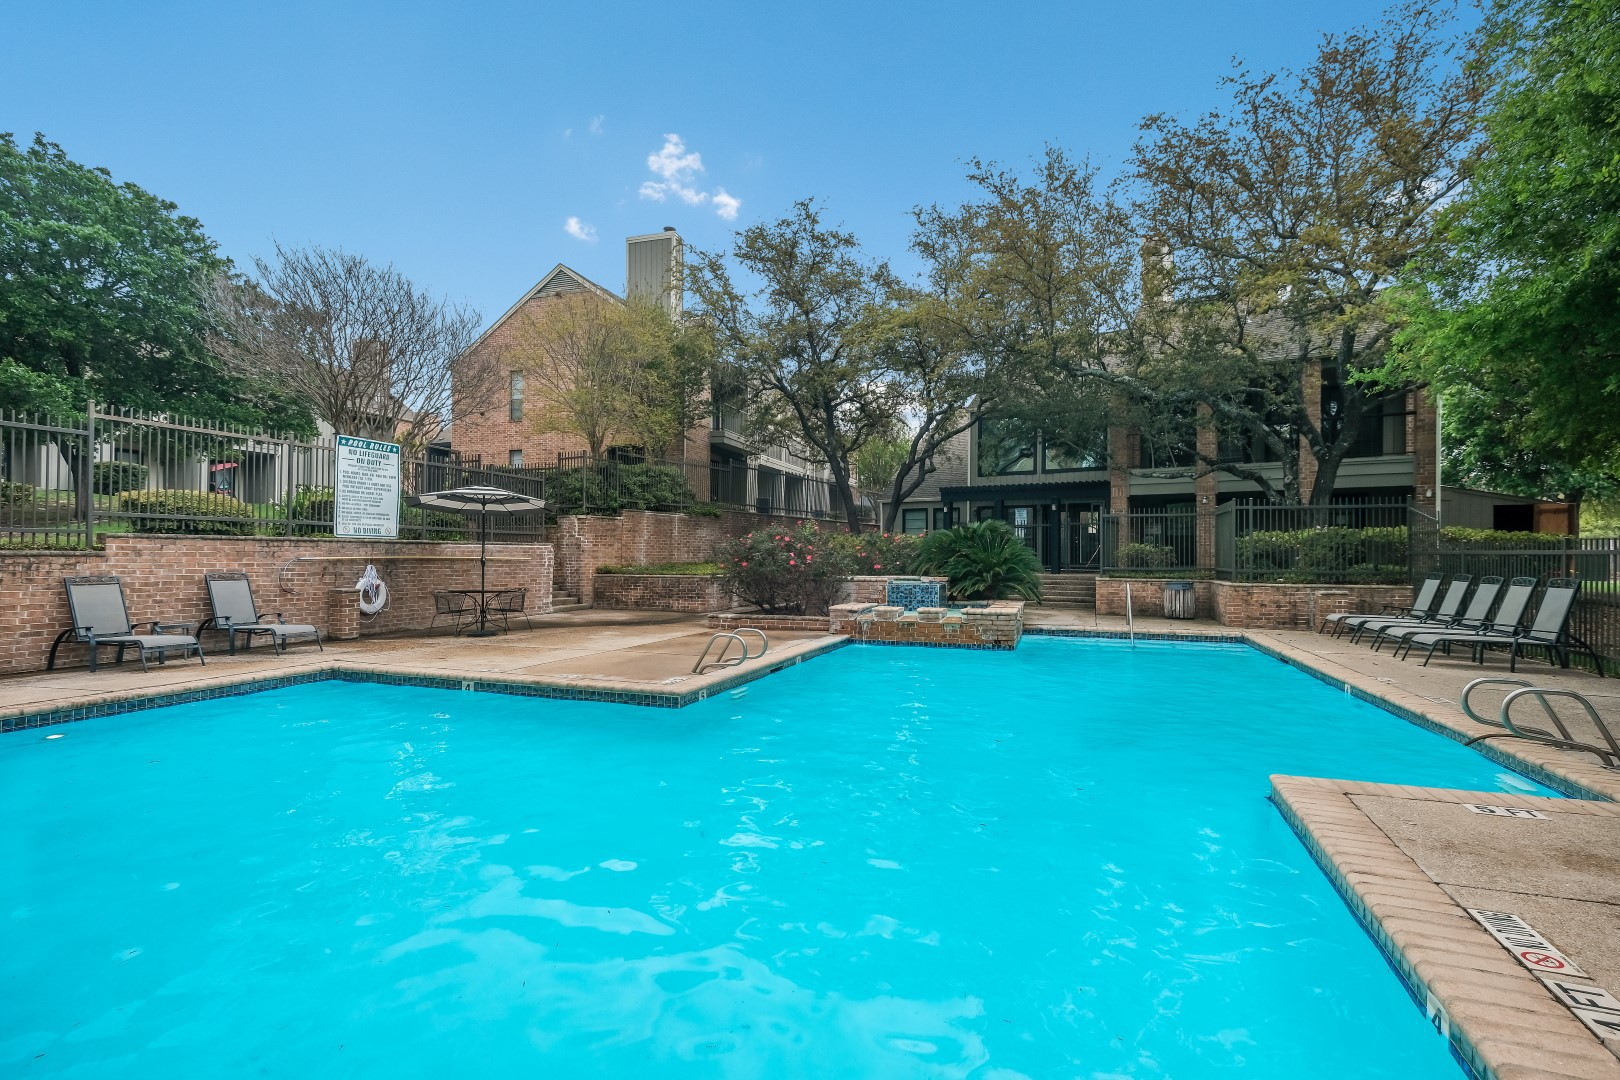 Apartments Near Trinity Park Greene Townhomes for Trinity University Students in San Antonio, TX